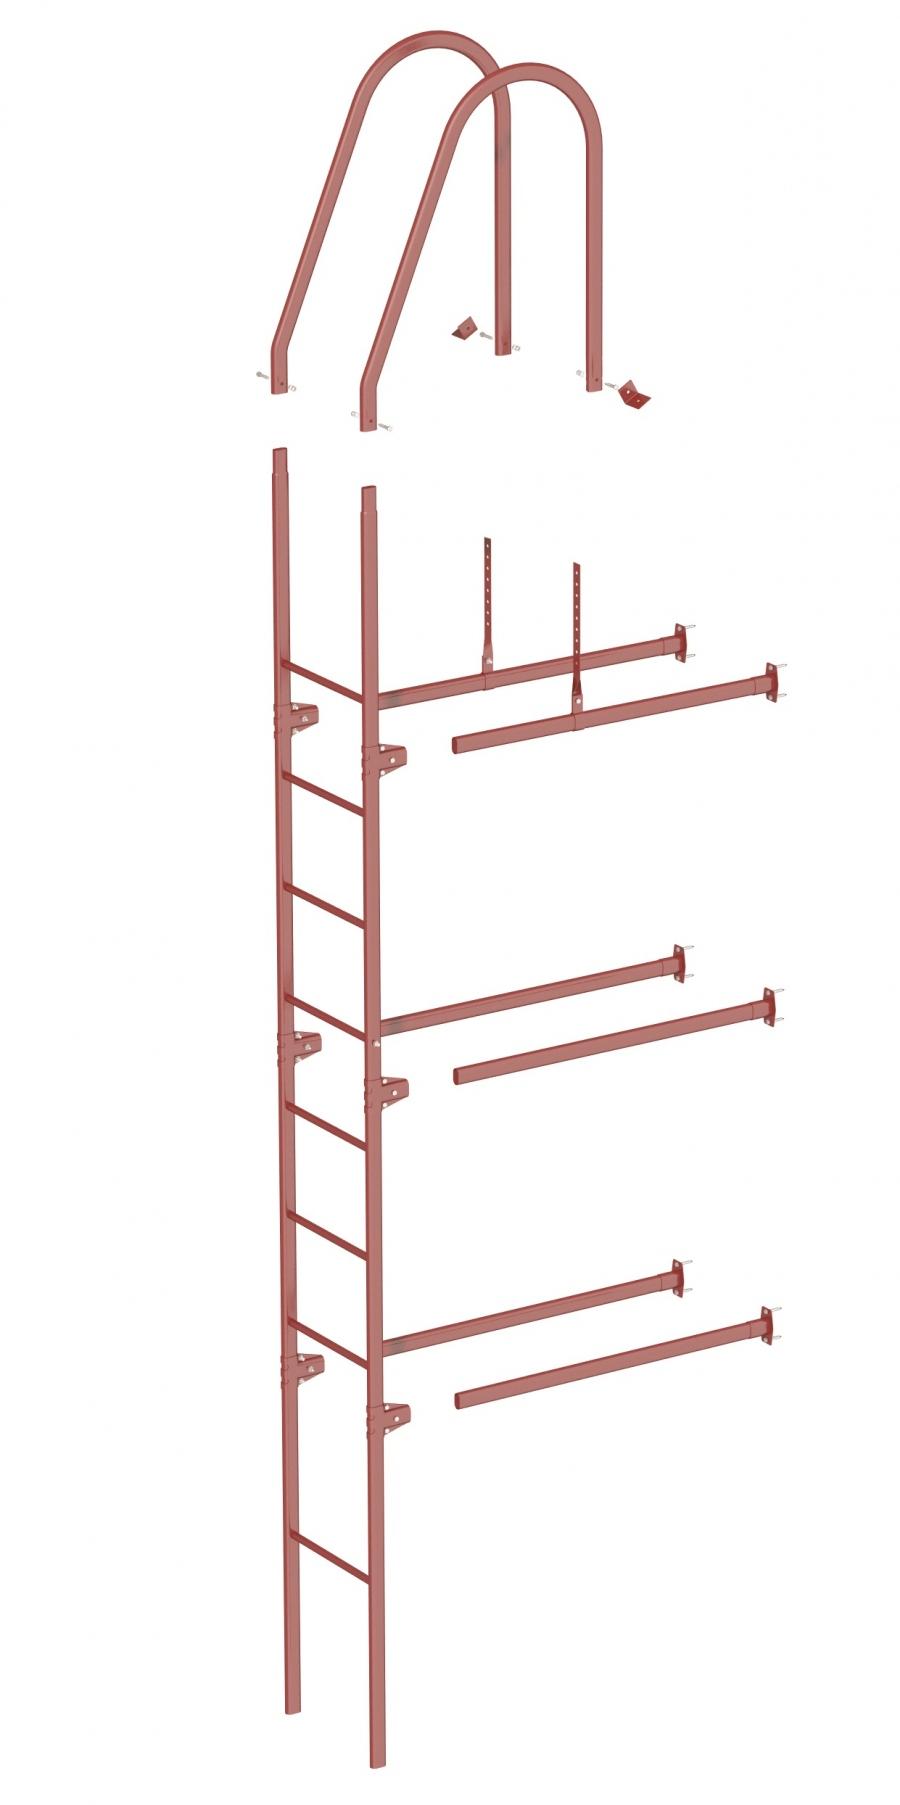 Комплект лестница фасадная BORGE 1,8 м (верхняя секция)